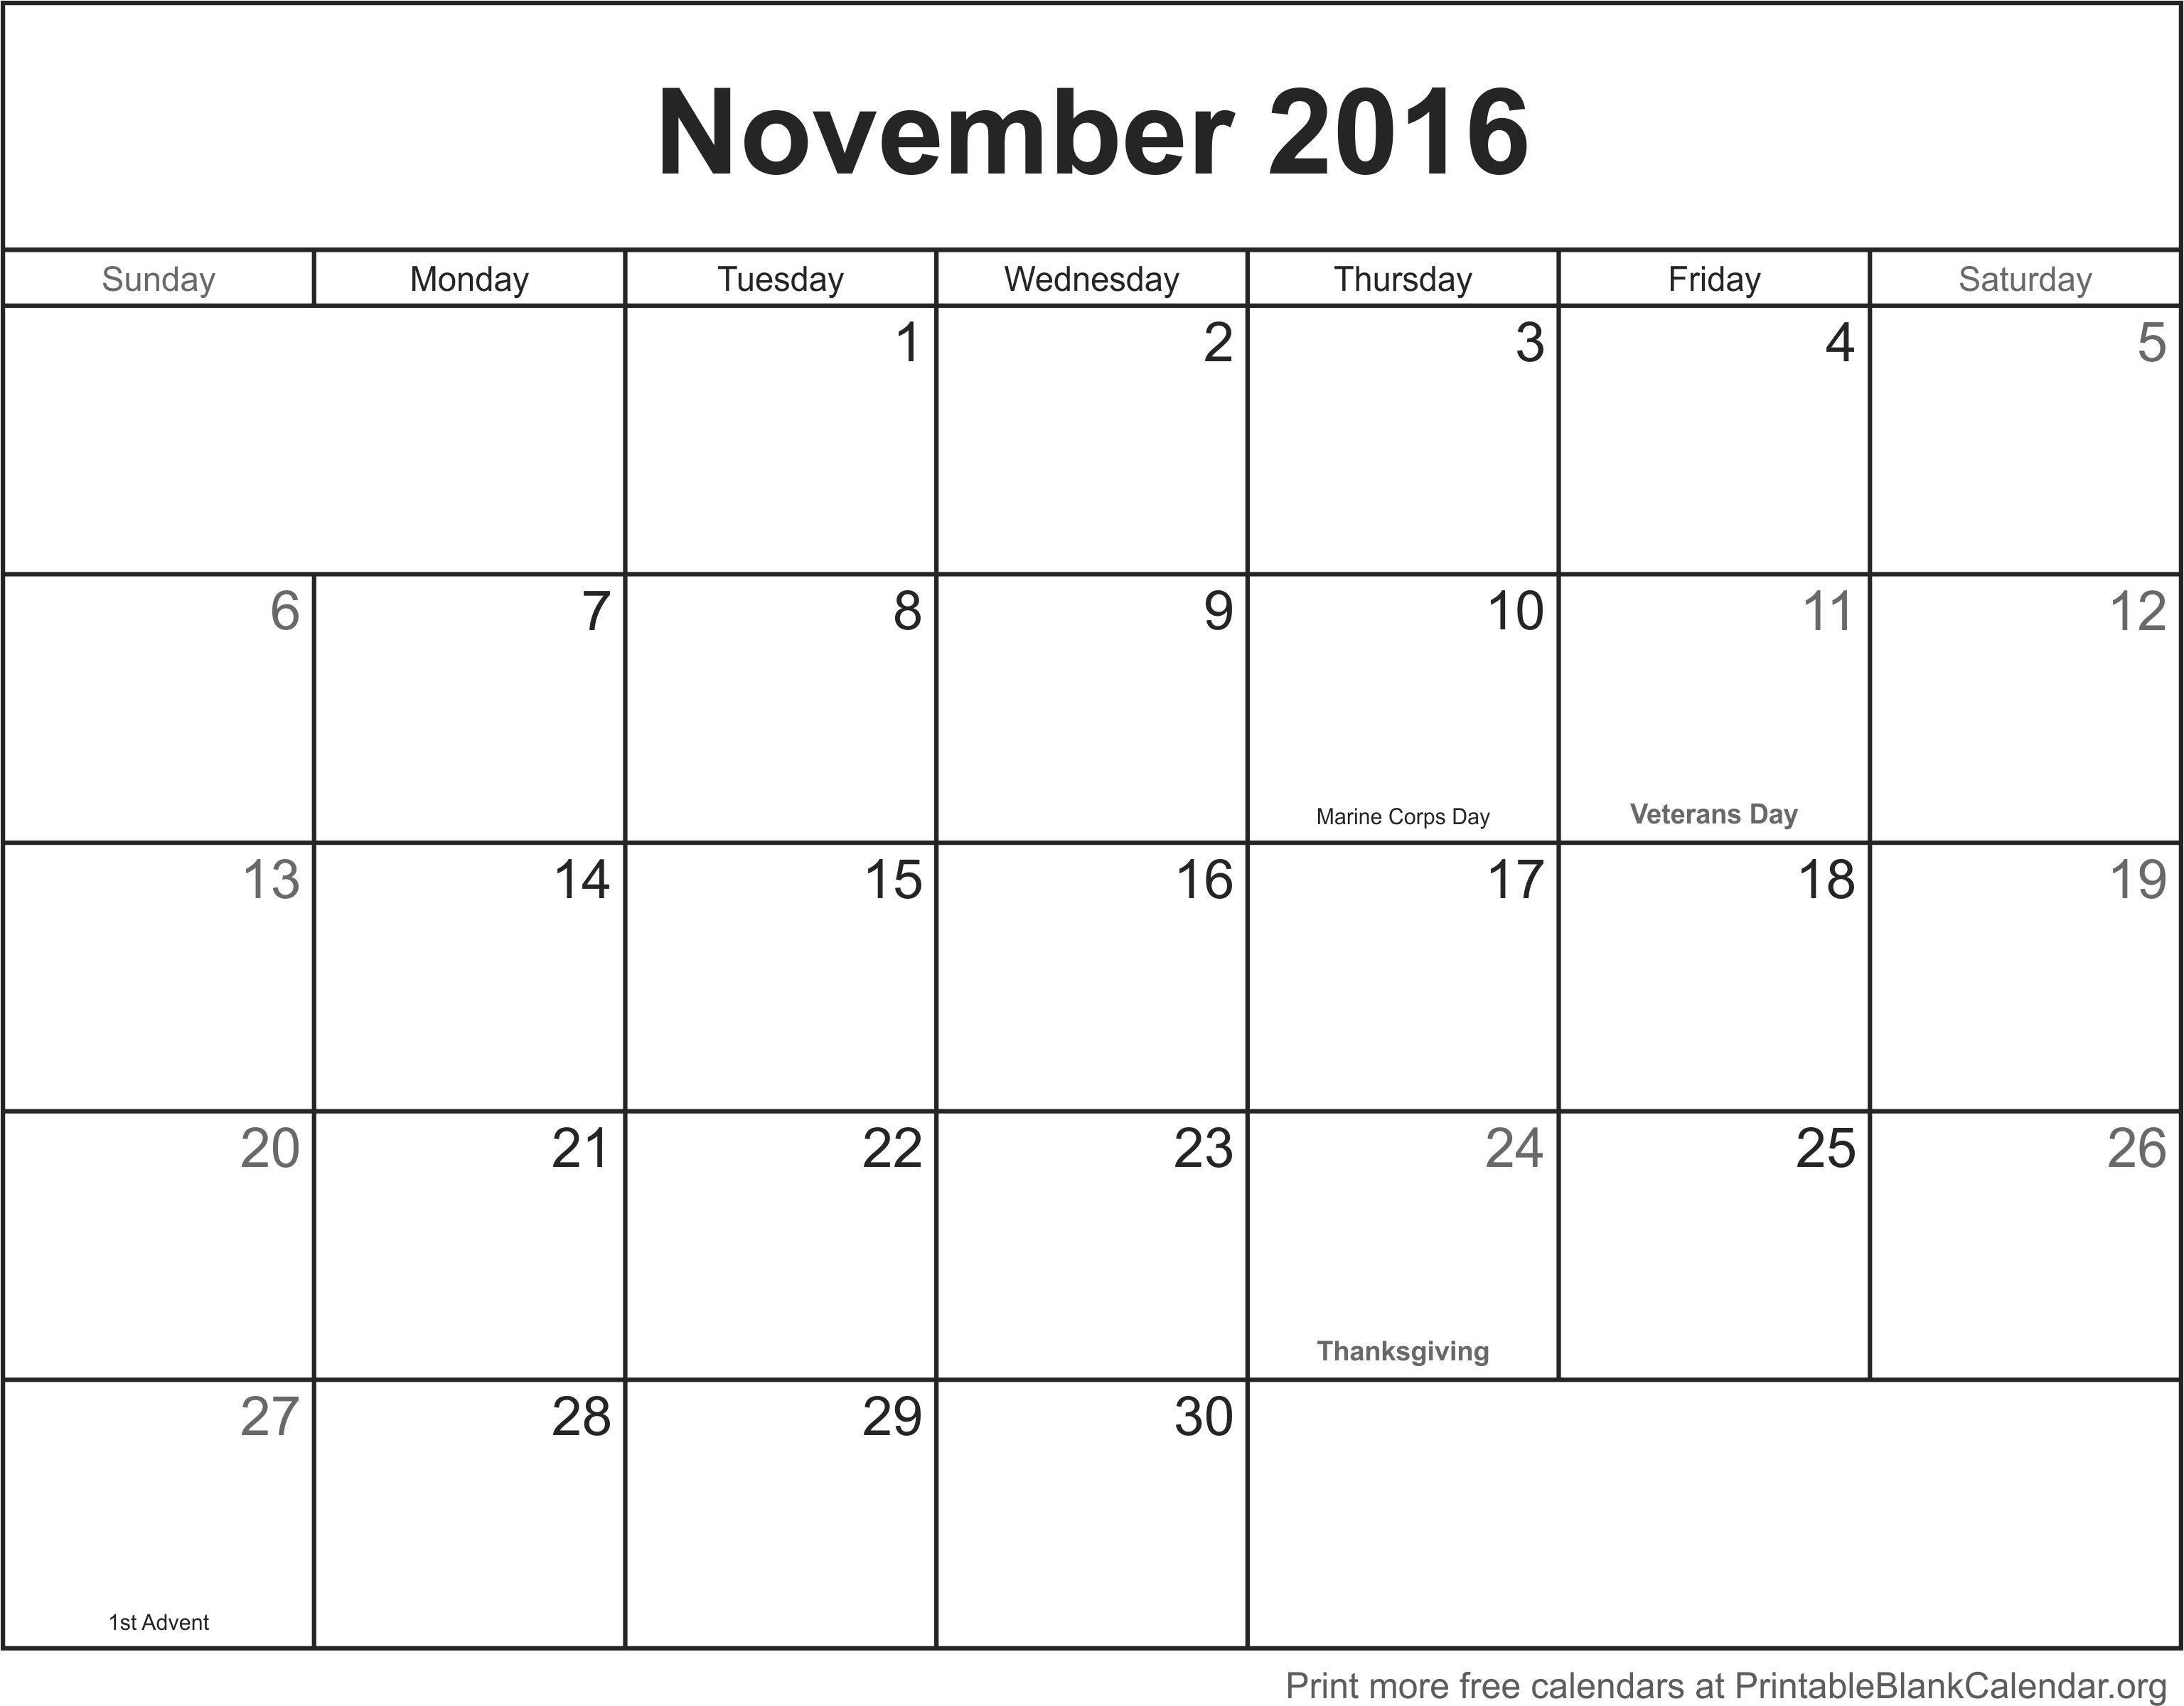 November Monthly Calendar Template : November printable blank calendar